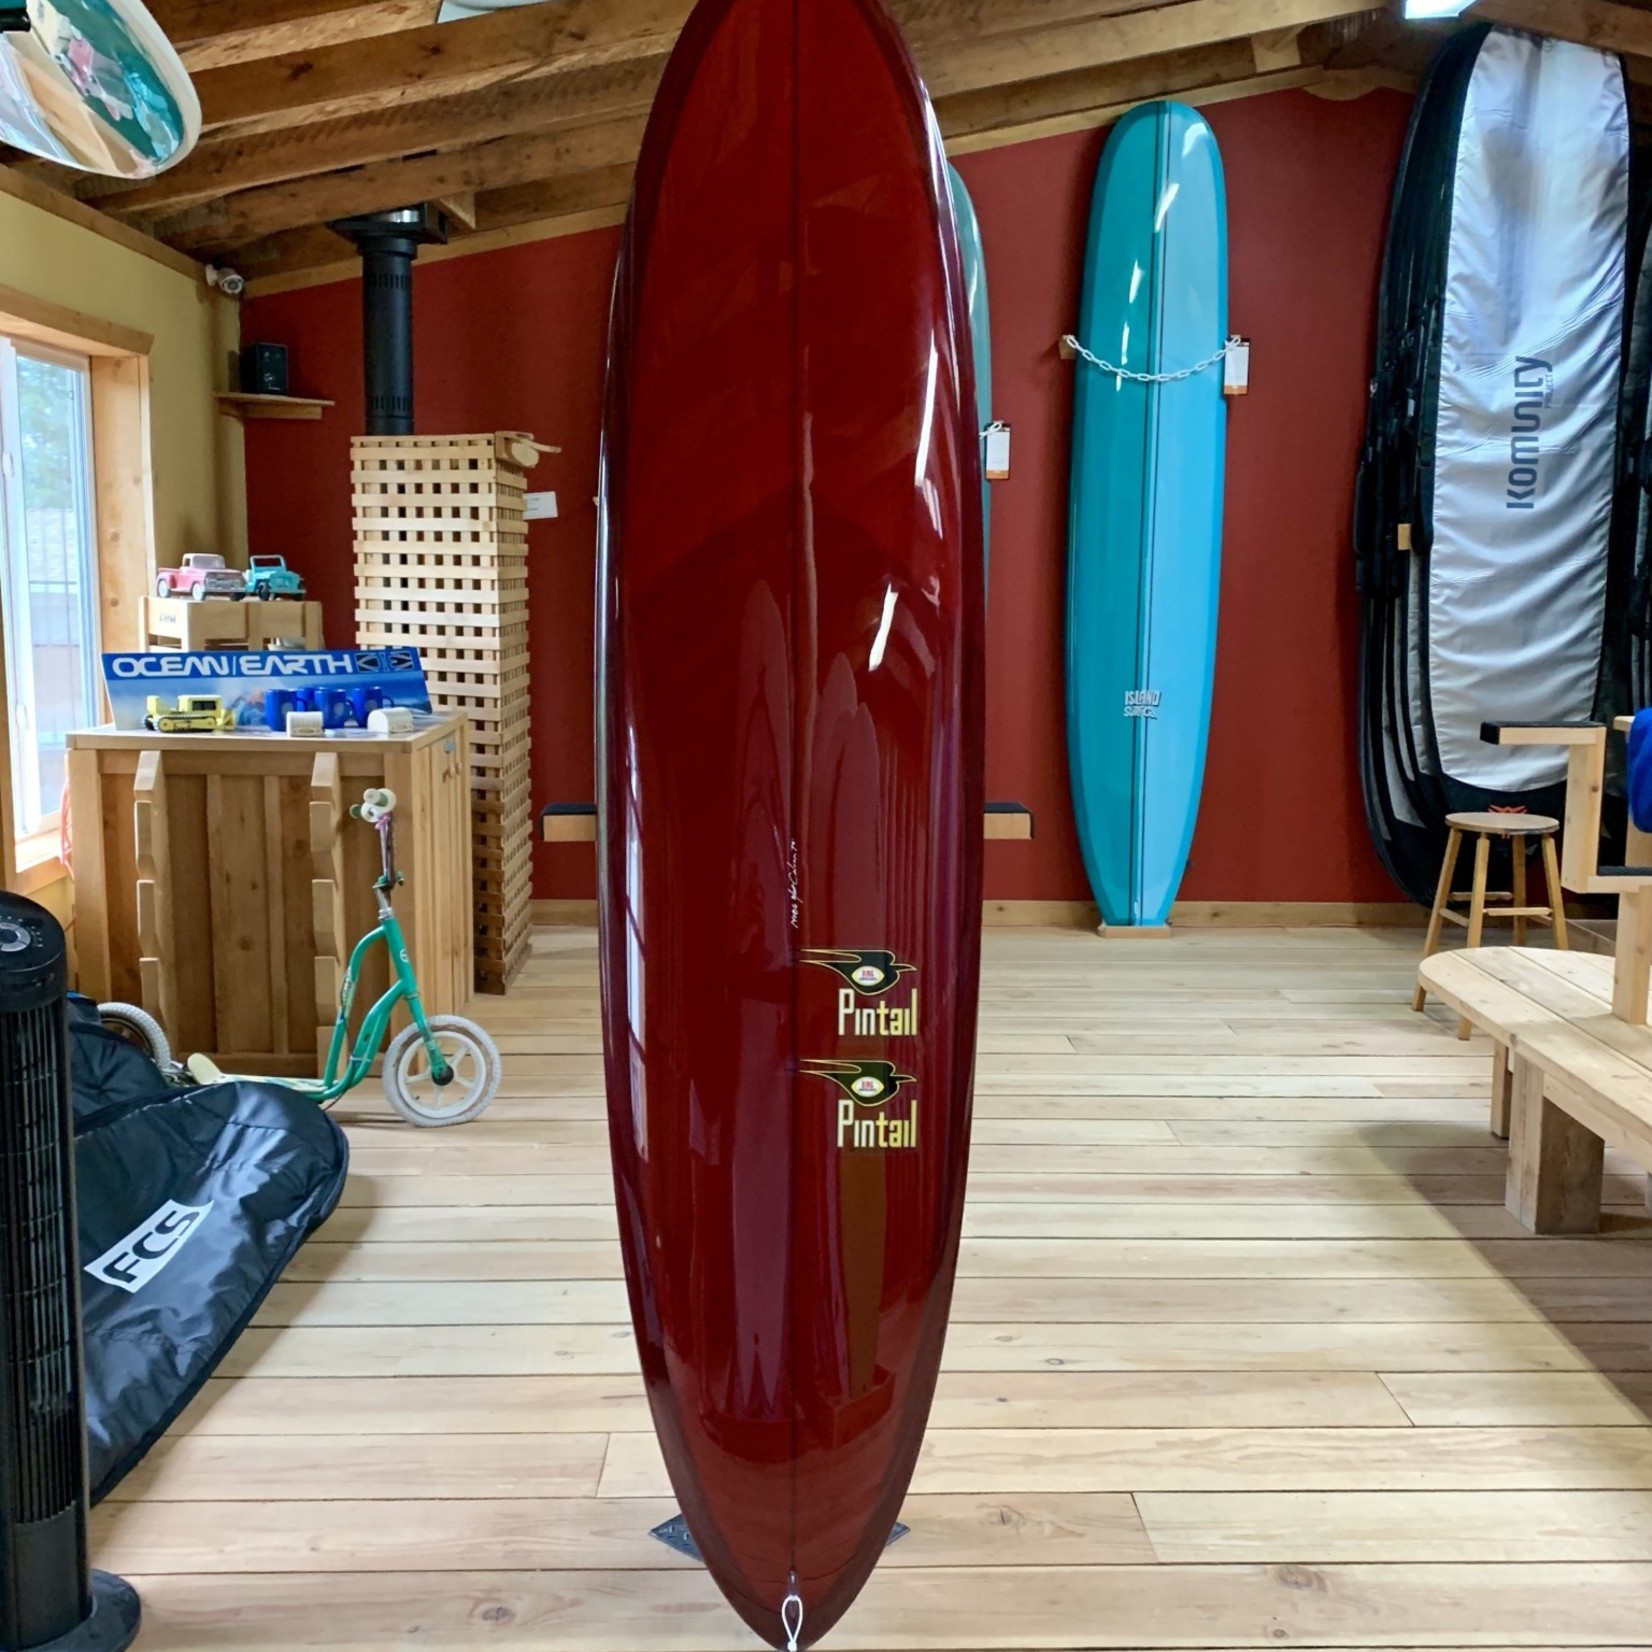 Bing Surfboards 7'8 Bing Pintail Mini Performance Surfboard.